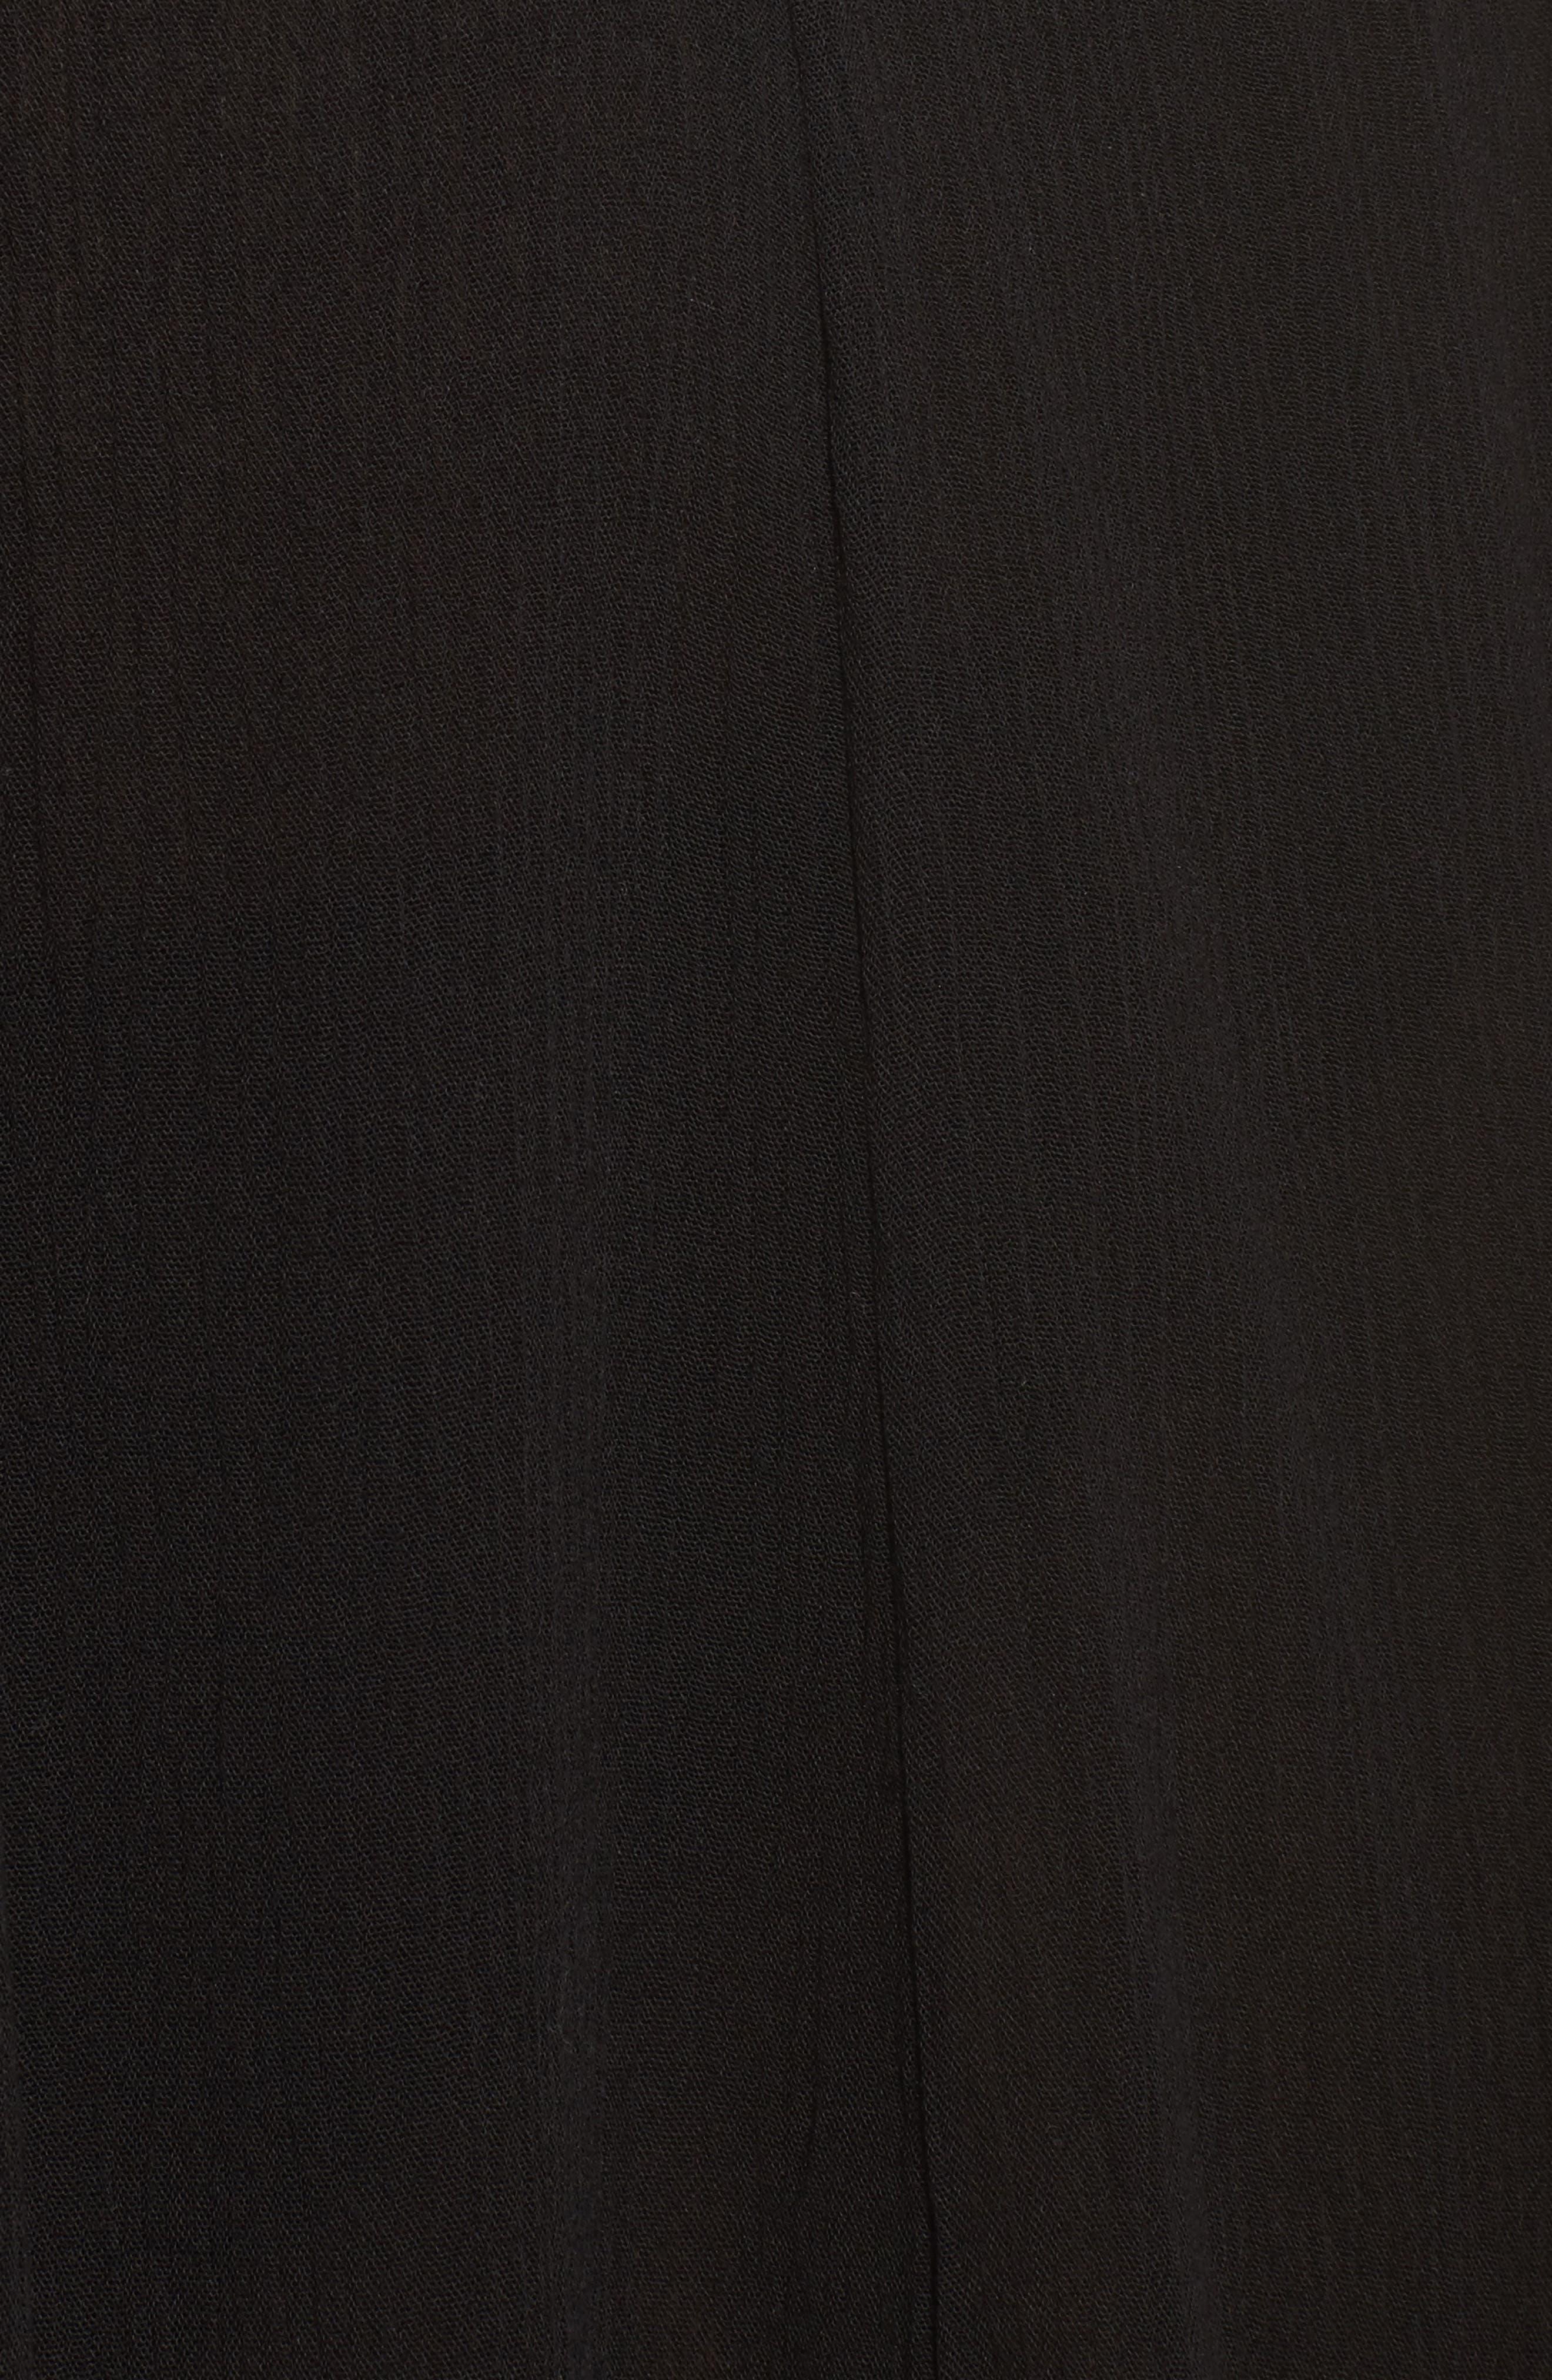 Cutout Cover-Up Maxi Dress,                             Alternate thumbnail 5, color,                             Black